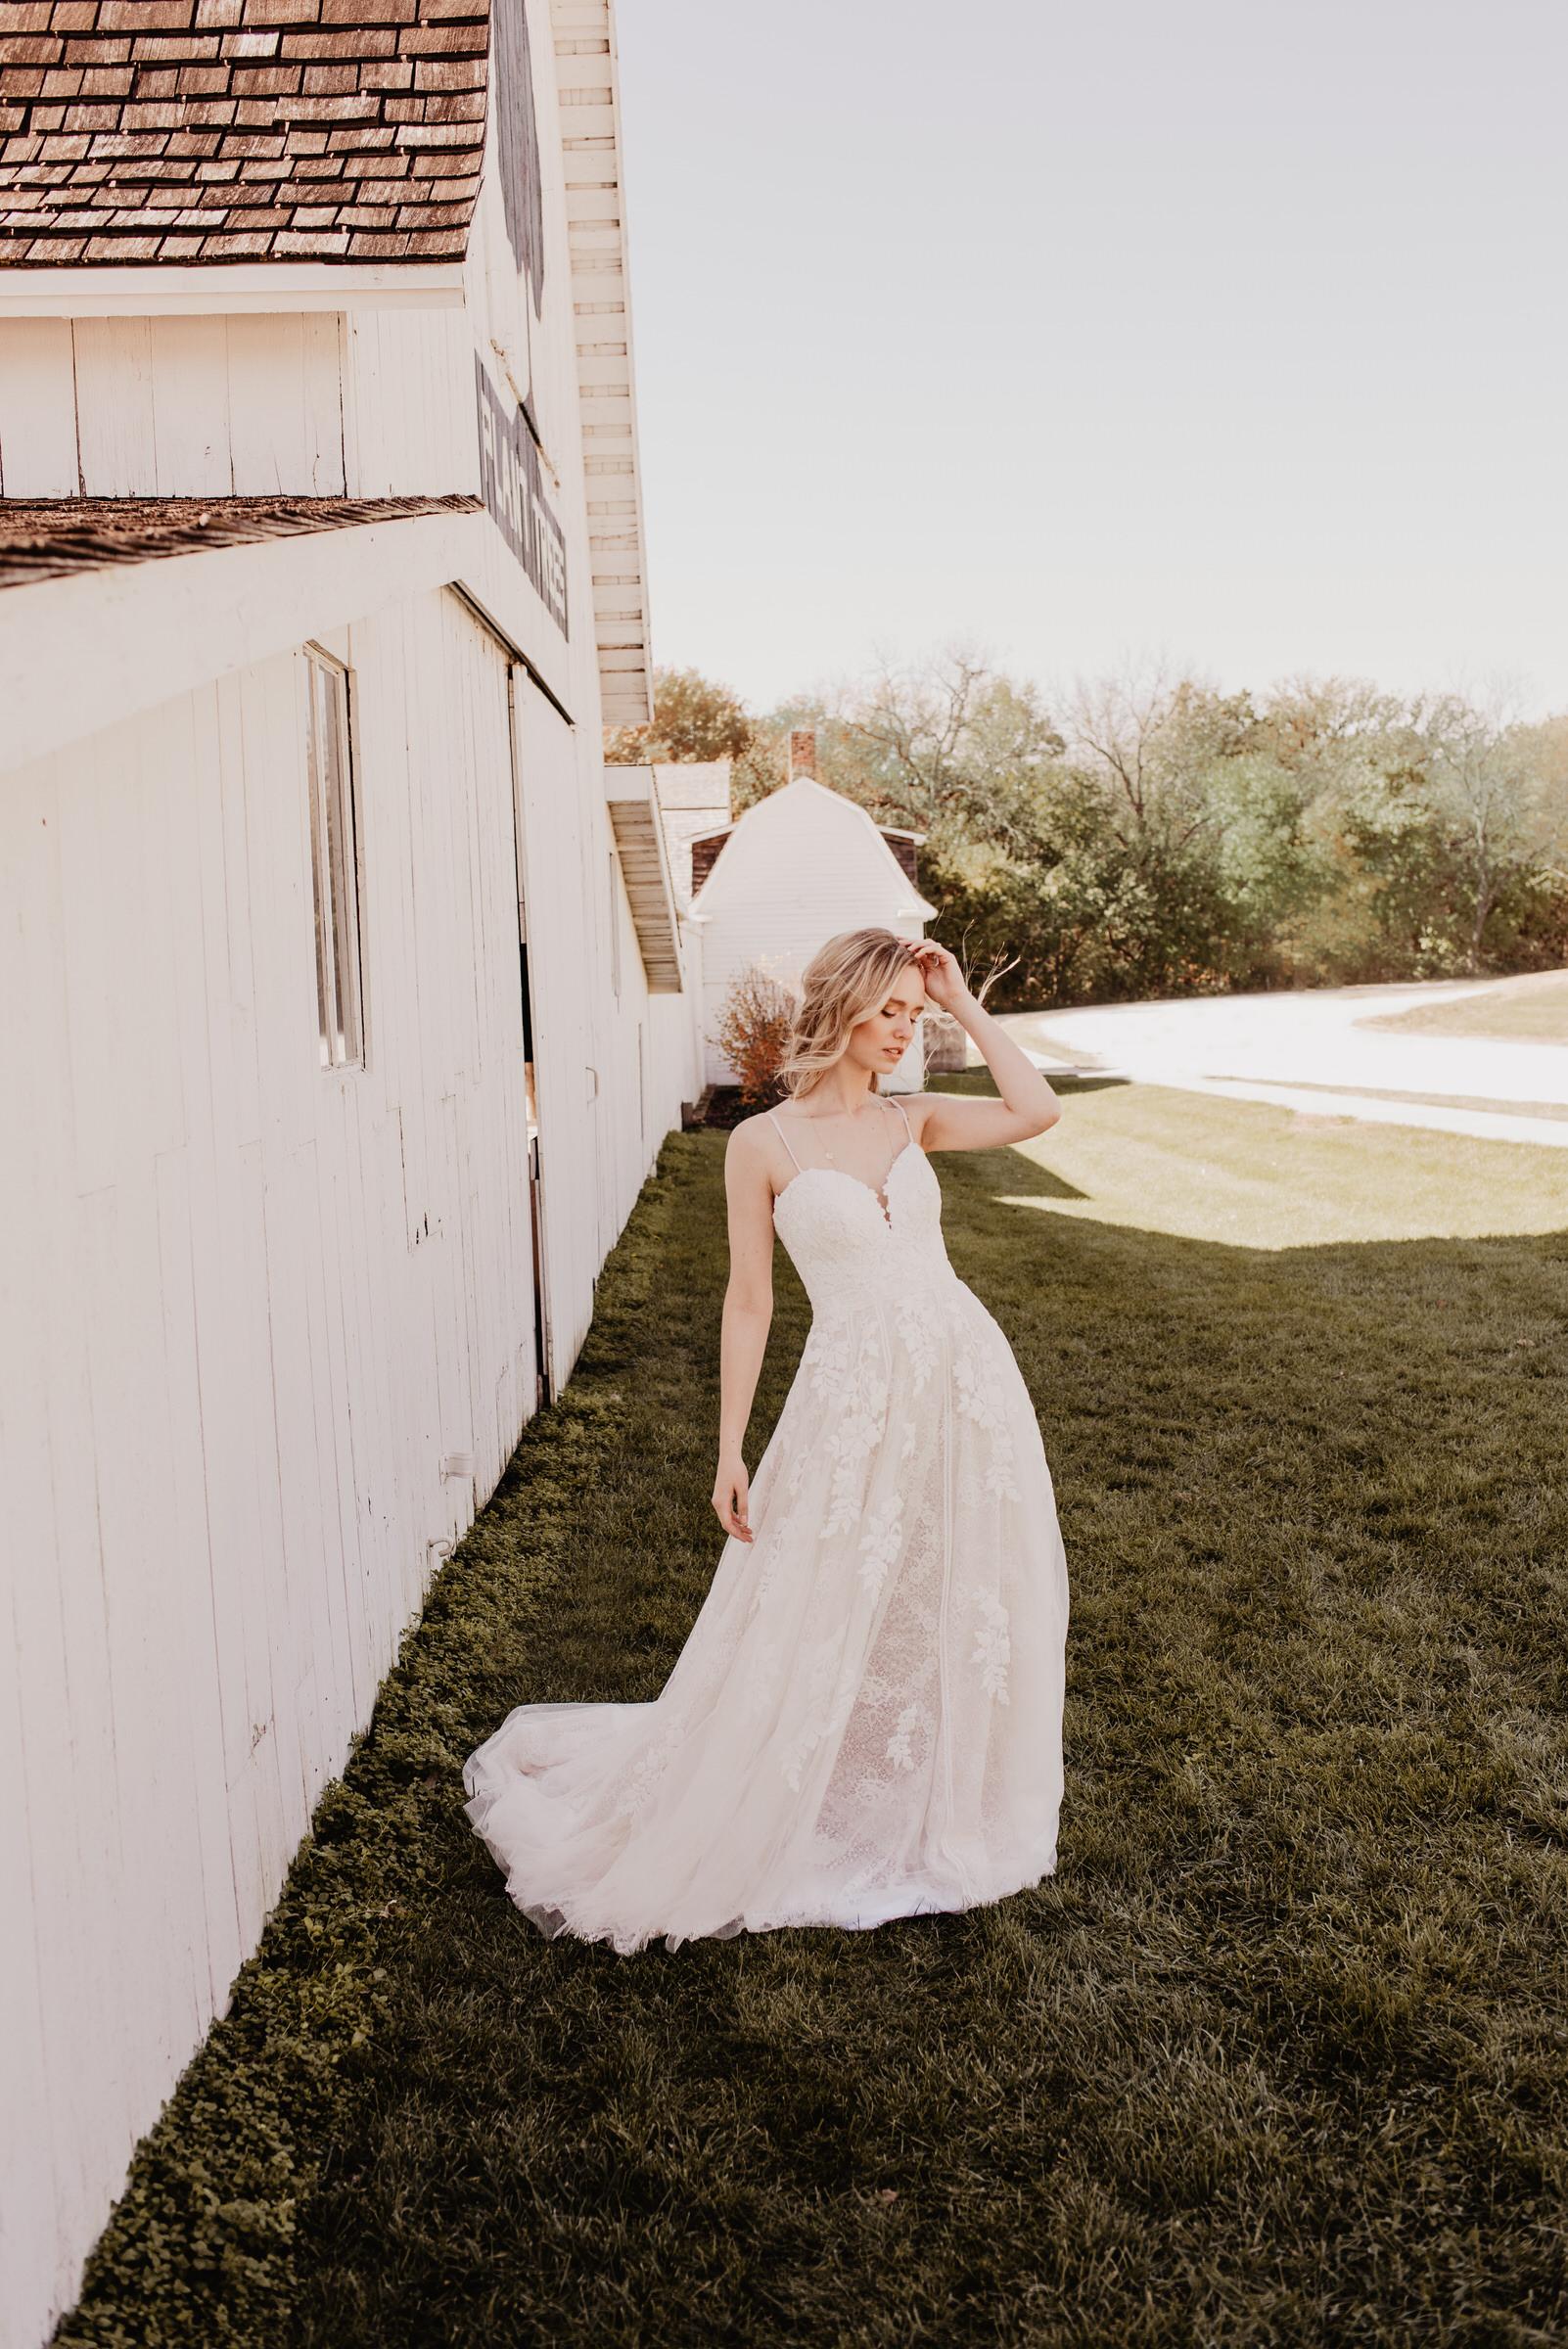 Kaylie-Sirek-Photography-NWD-SS19-20.jpg